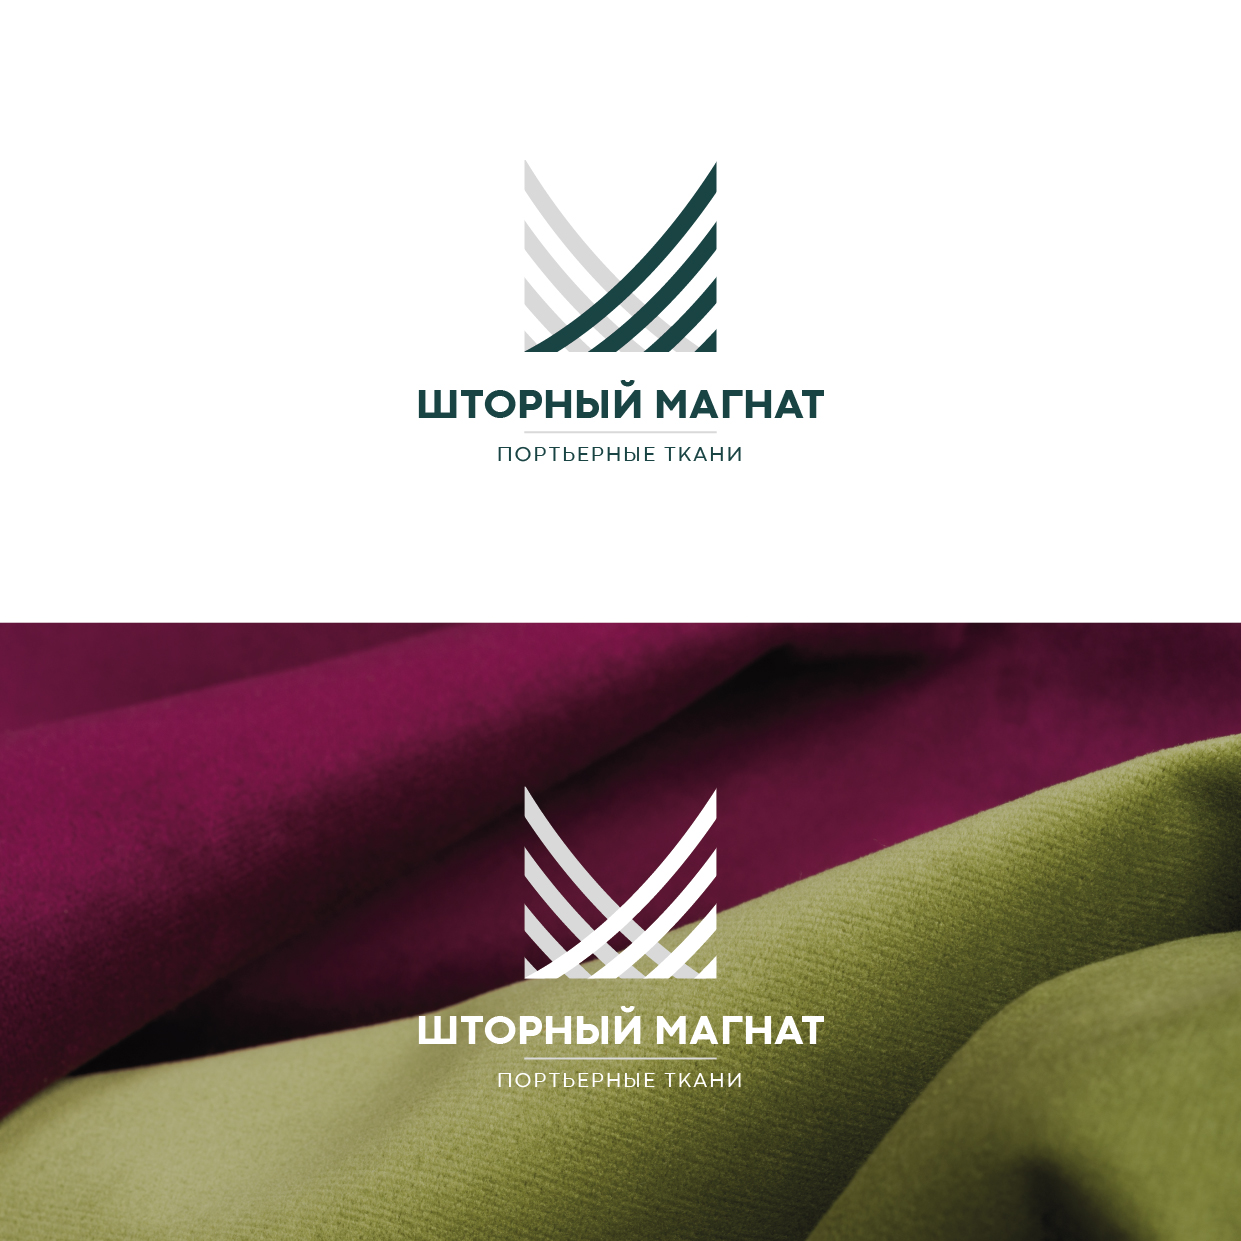 Логотип и фирменный стиль для магазина тканей. фото f_3285cdbf65383f20.jpg